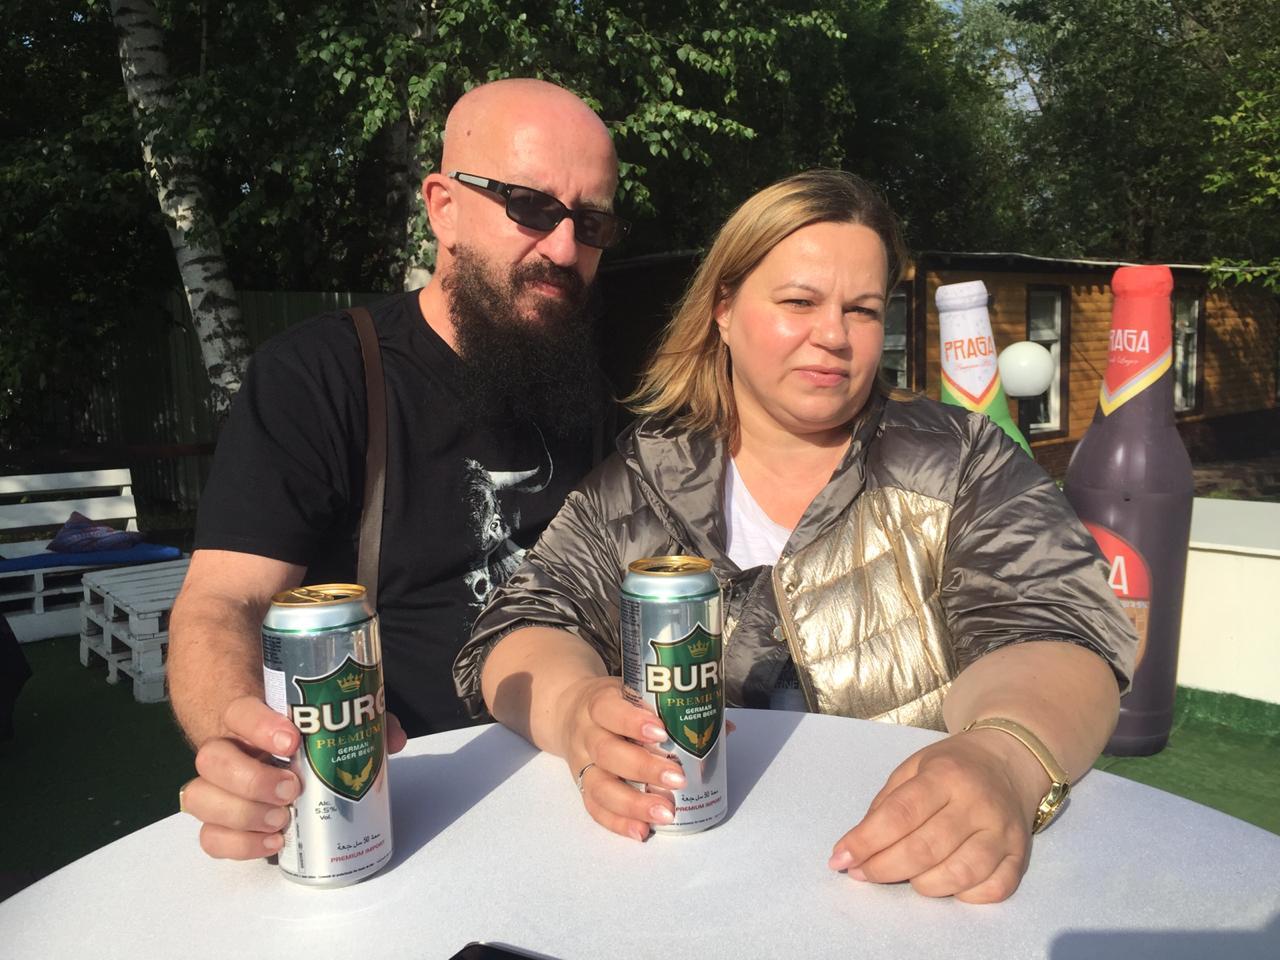 АССОЦИАЦИЯ ЛЮБИТЕЛЕЙ ПИВА «THE BEST OF BEER» представляет — пиво BURG от компании InterPortfolio